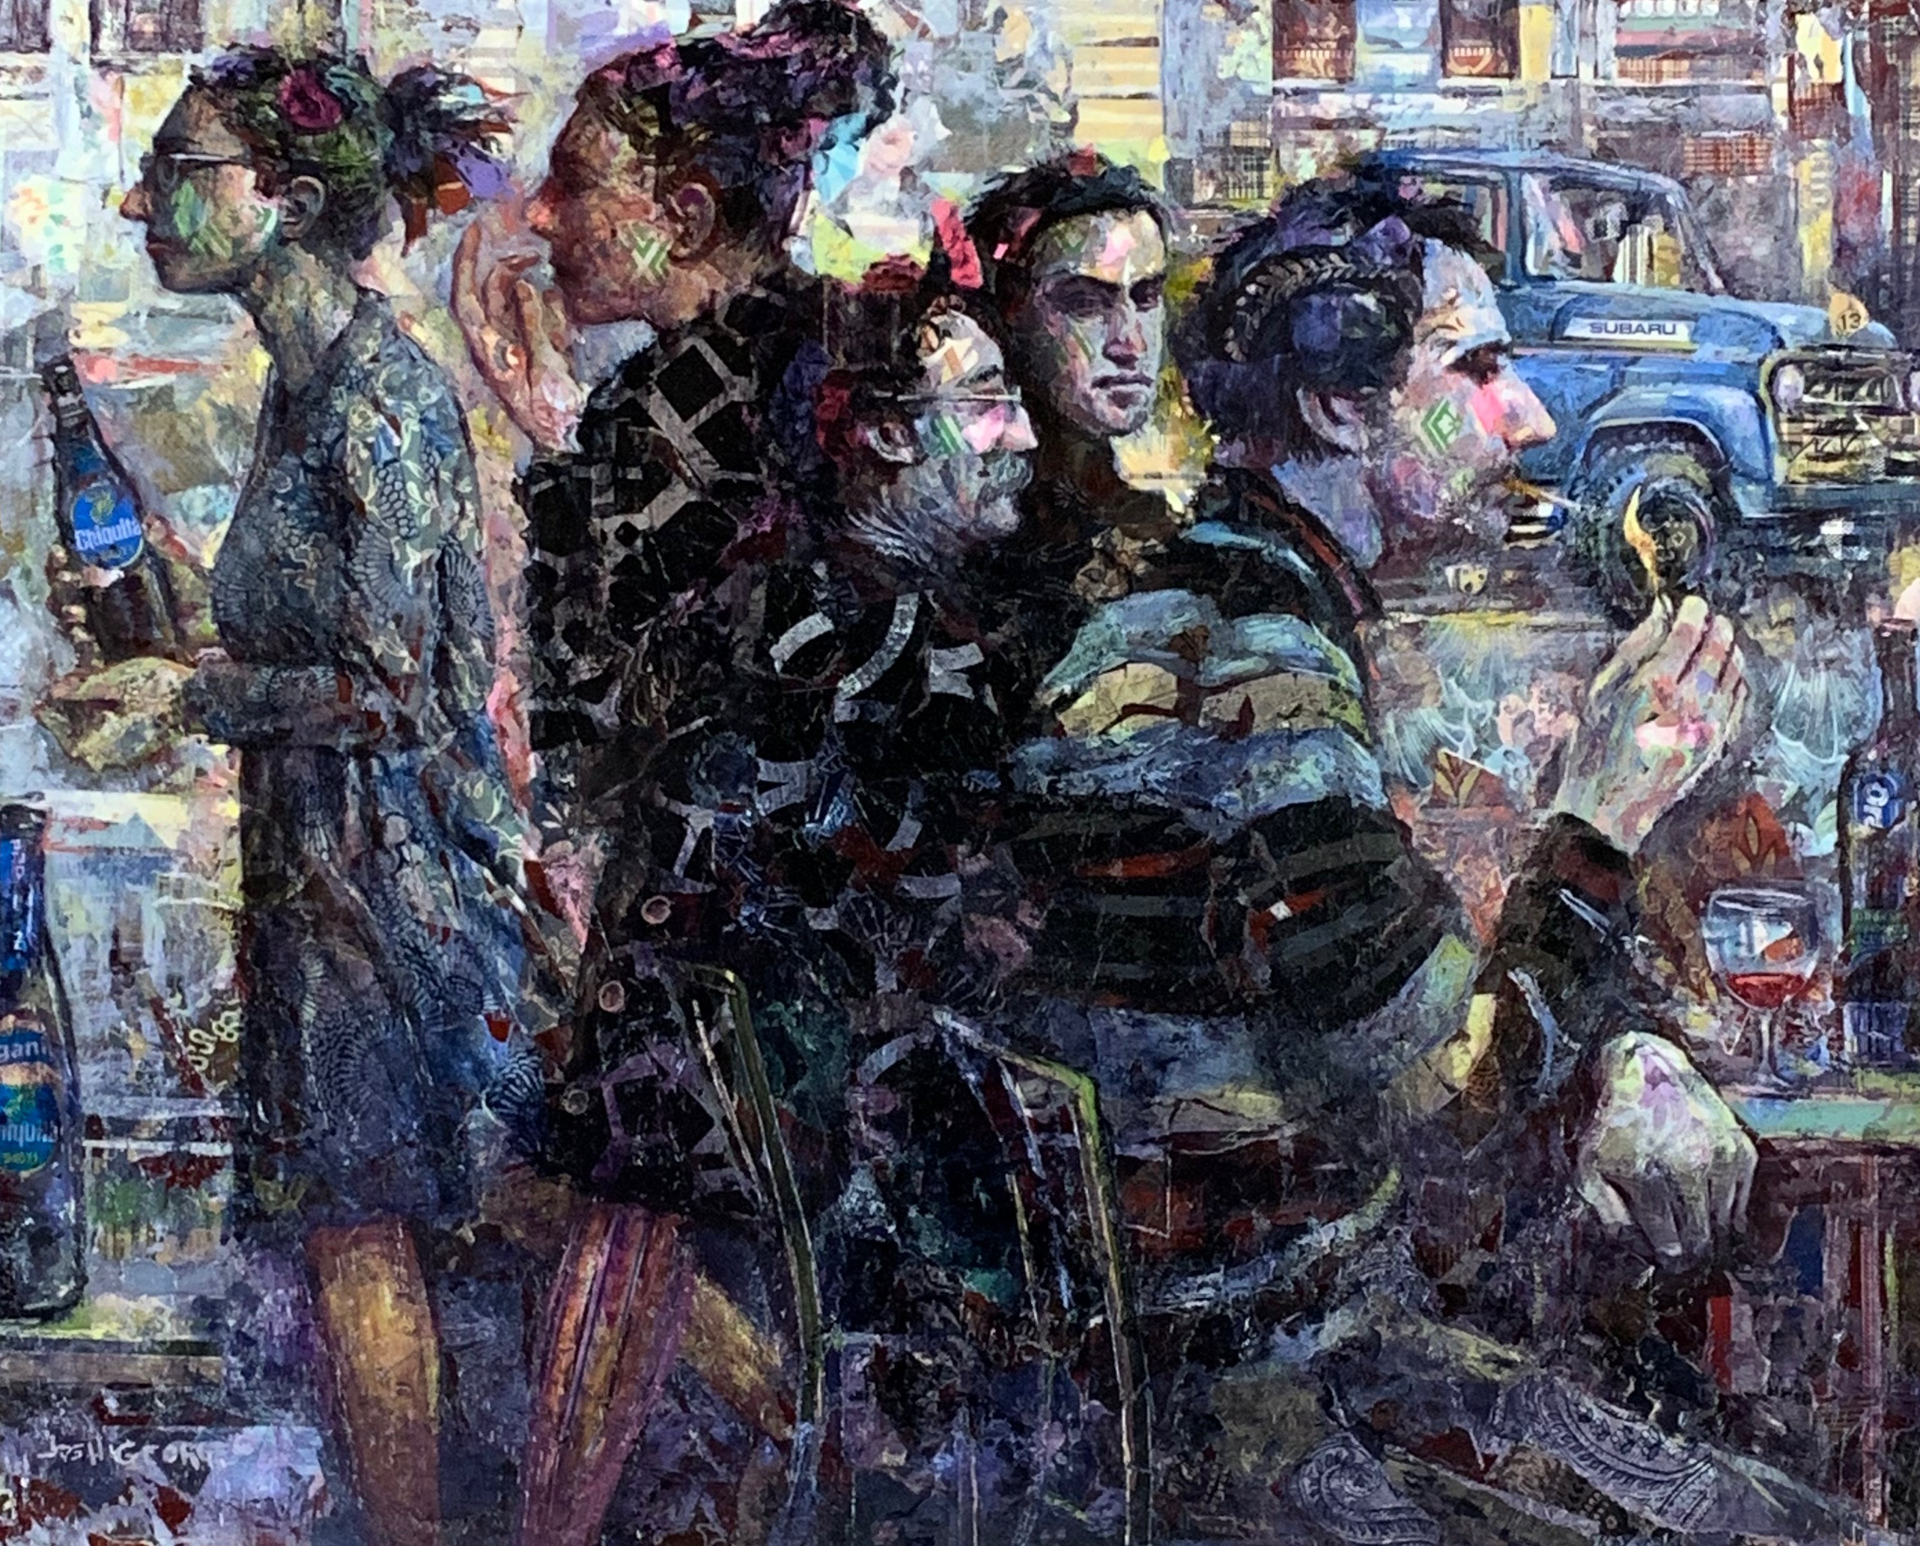 tradition, progress, stagnation by Josh George